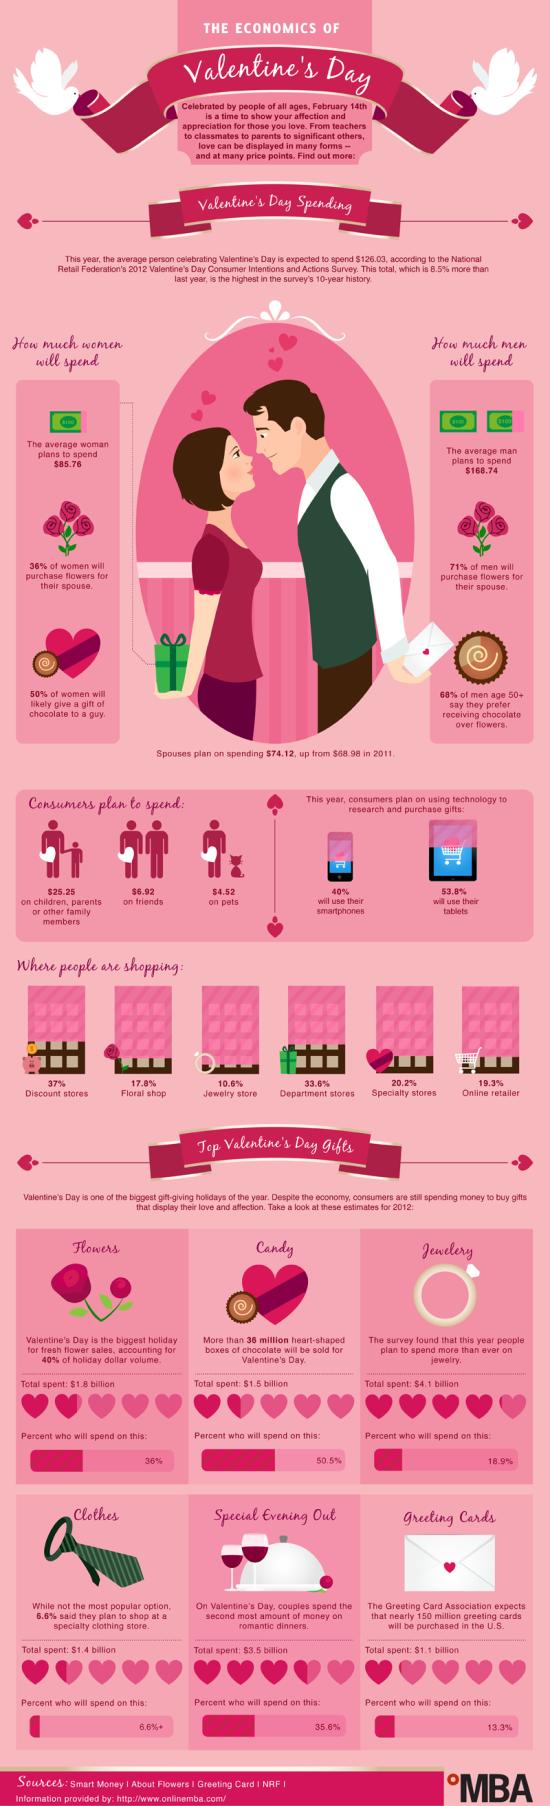 Ekonomika dne sv. Valentýna – Infografika